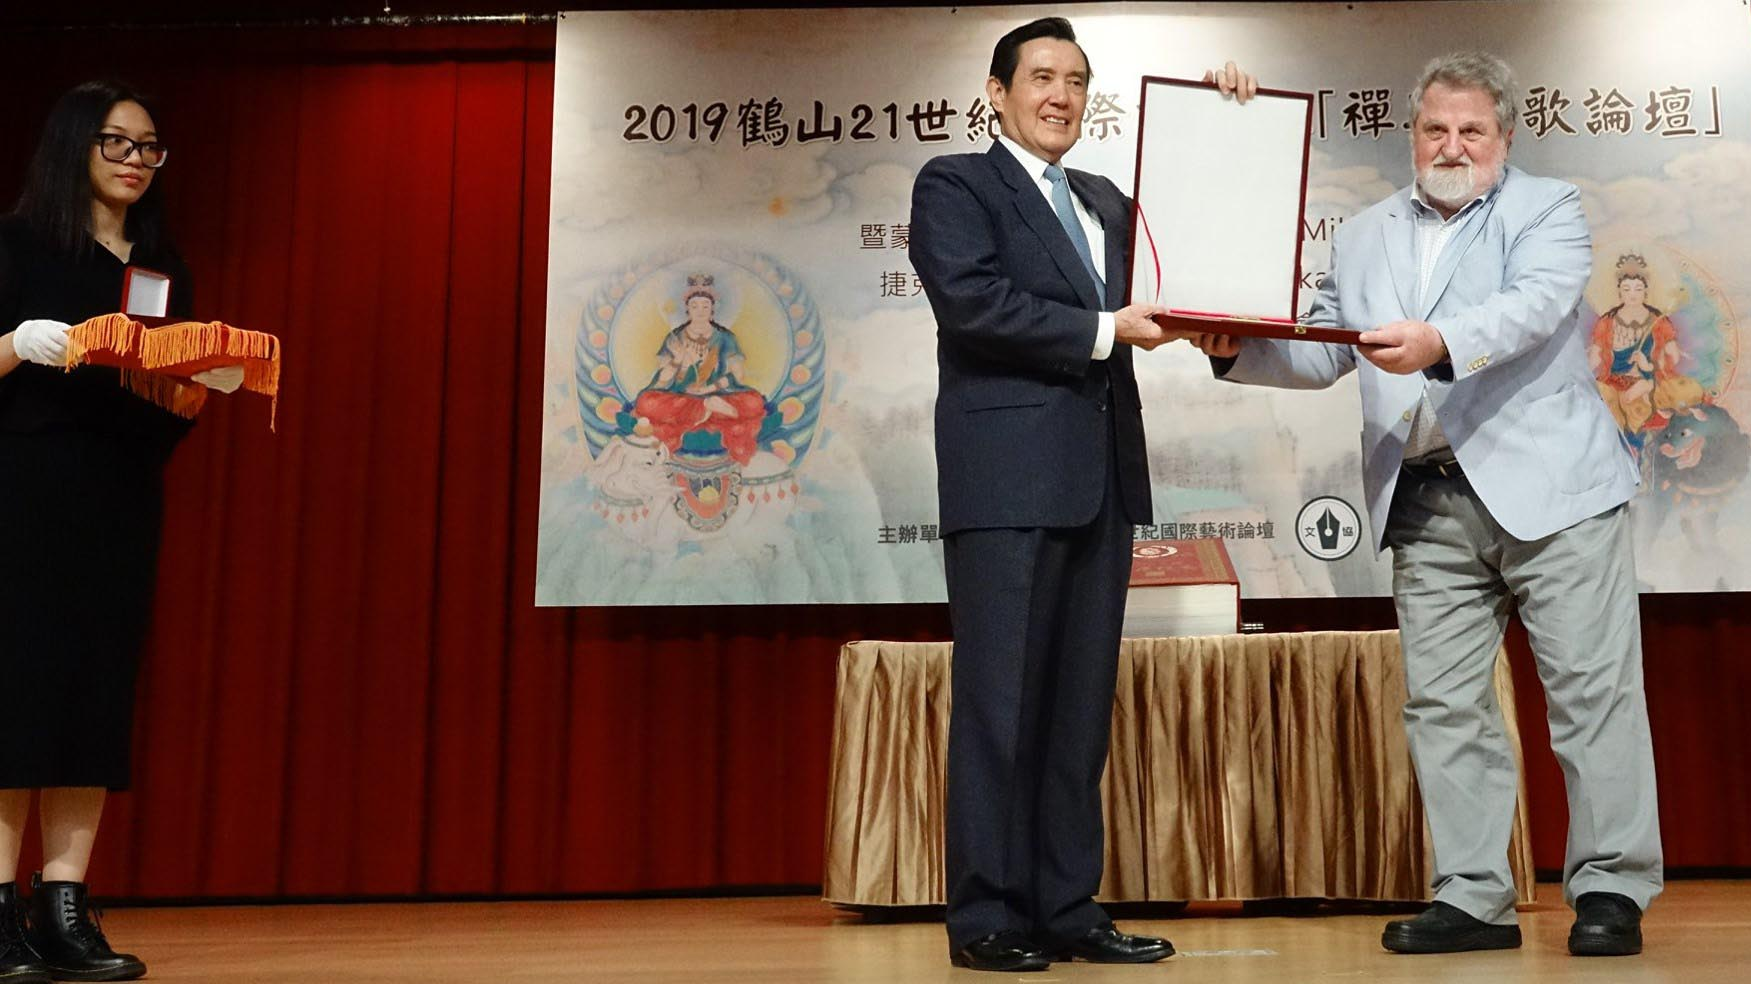 Prezident Ma odovzdáva M.Richterovi plaketu a medailu Crane Summit